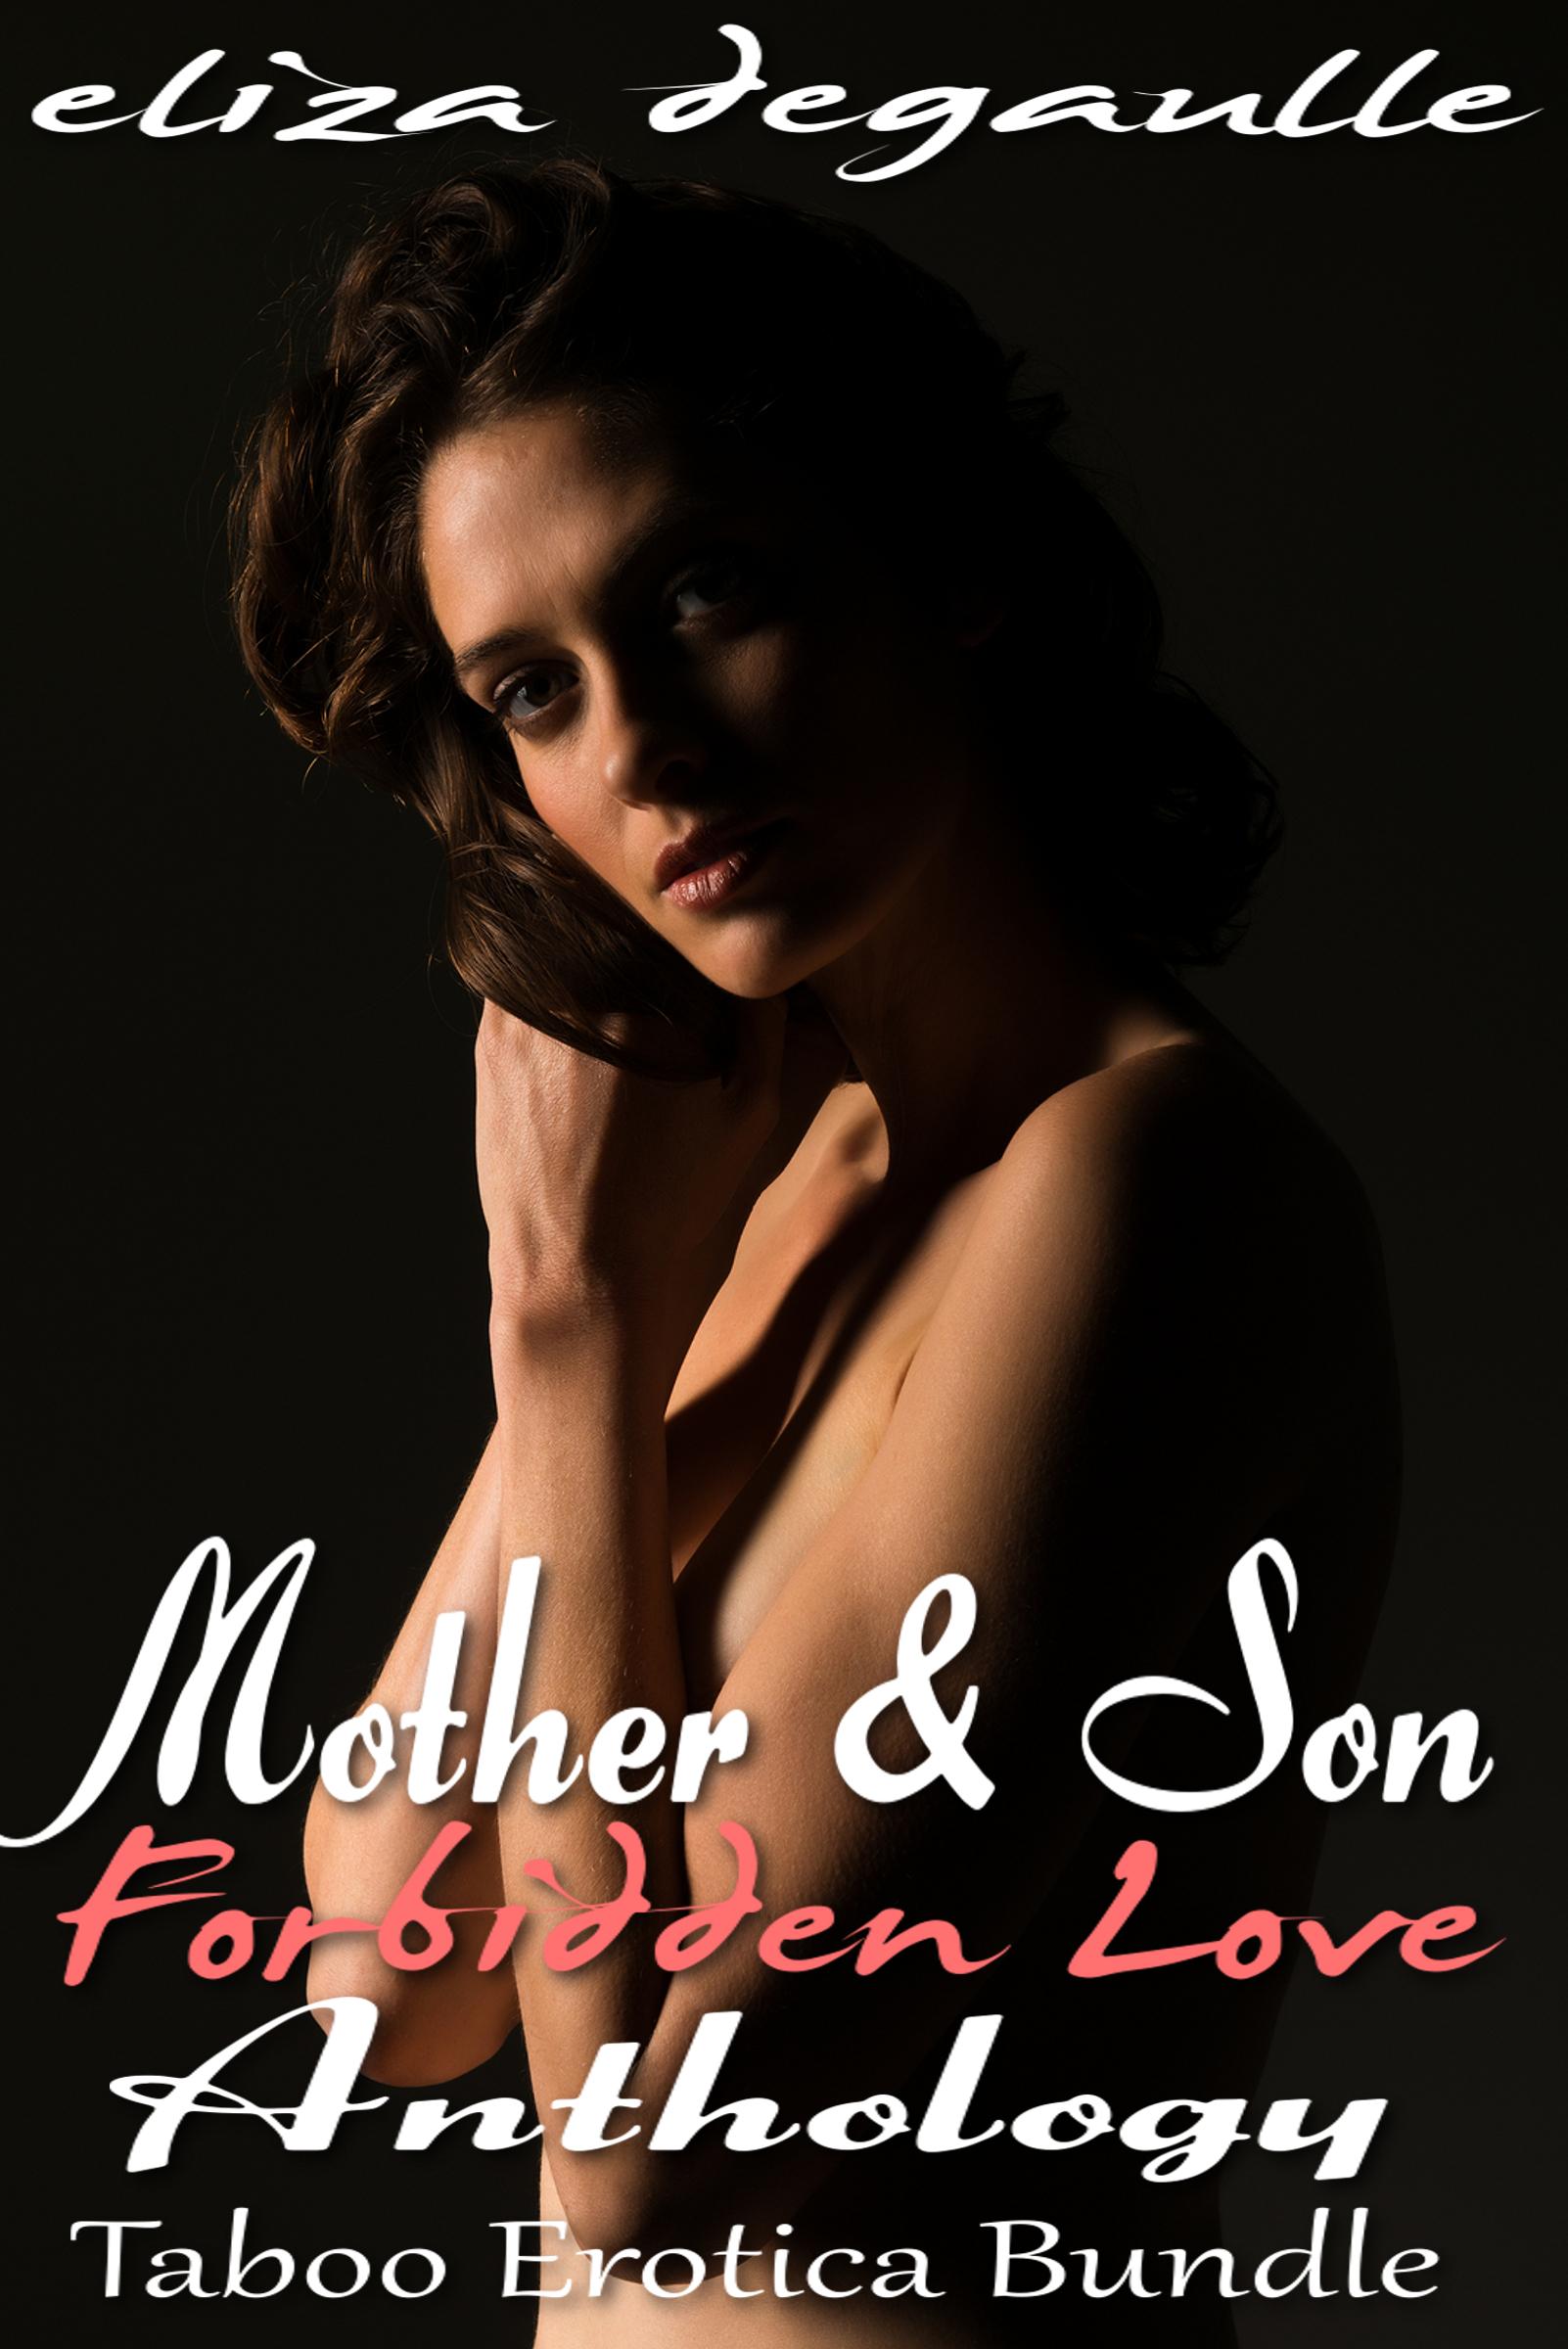 The Mom Found The Erotic Books 2-2 - Slutloadcom